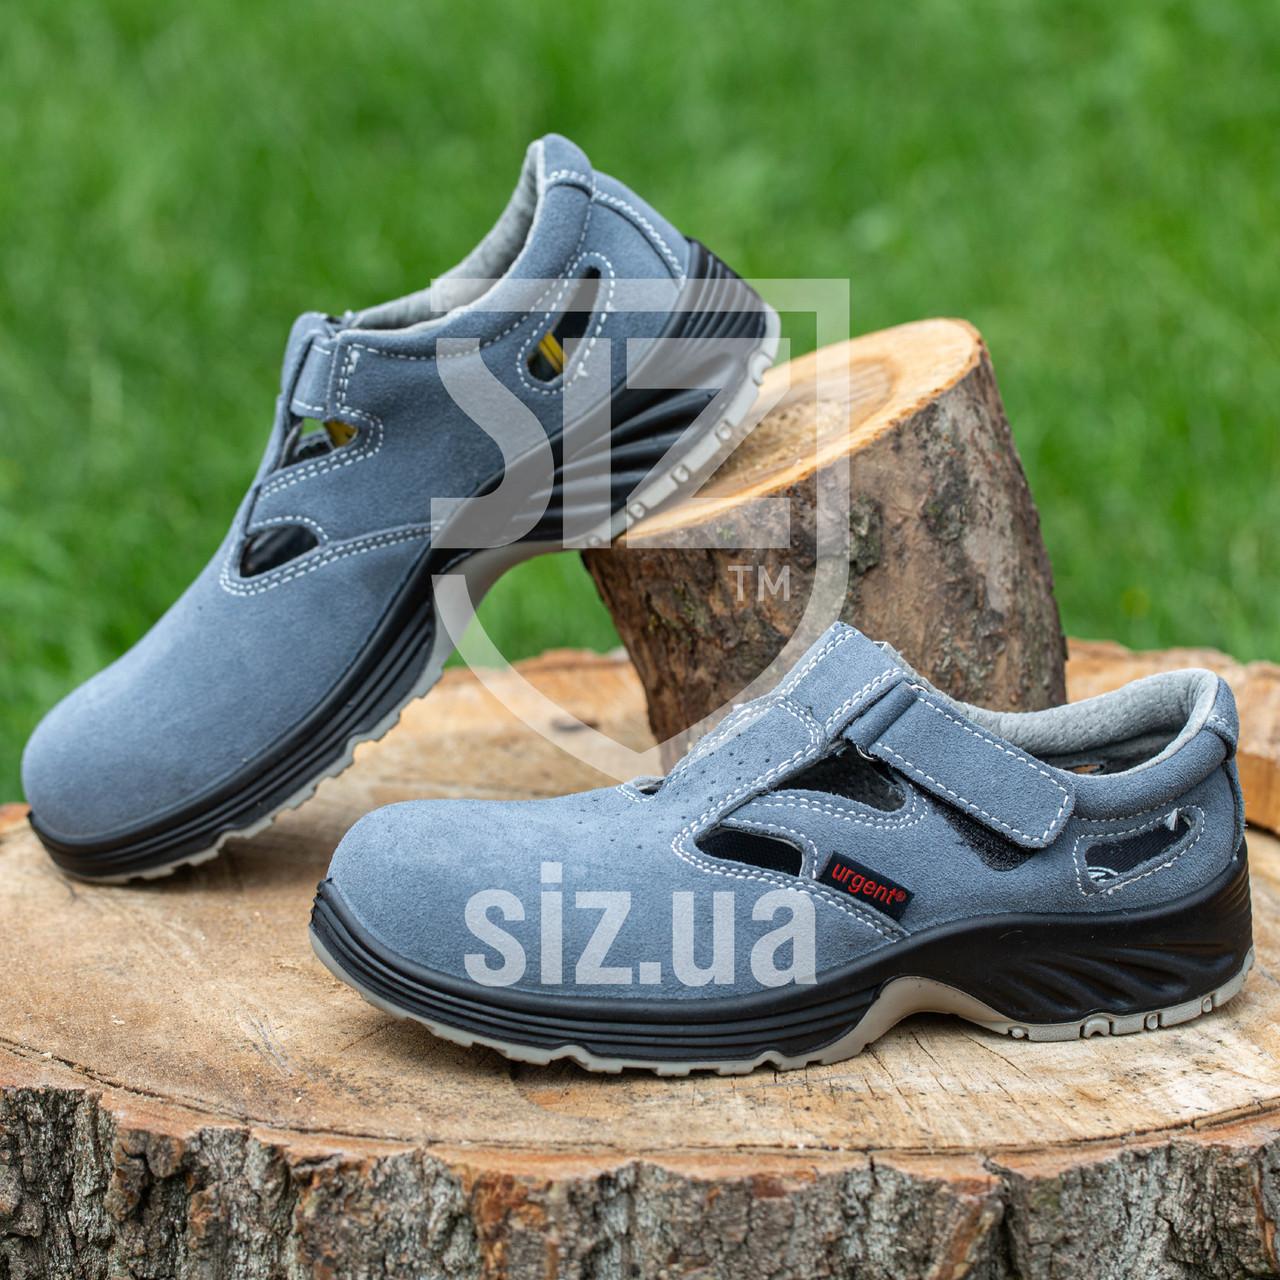 Сандали 302 S1 с  металлическим носком, антистатичные.  Urgent